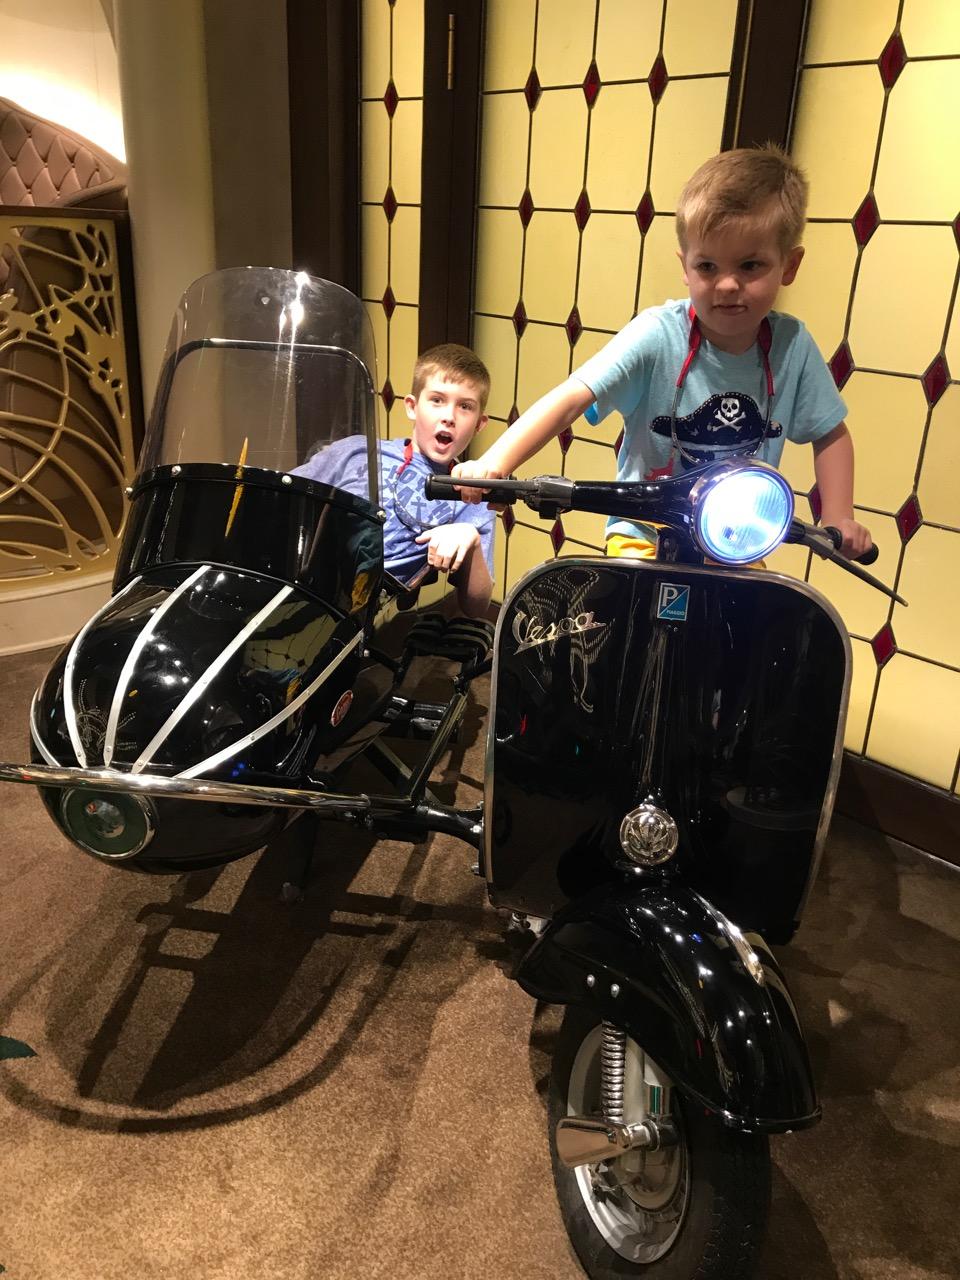 Disney Fantasy Deck Four Motocycle